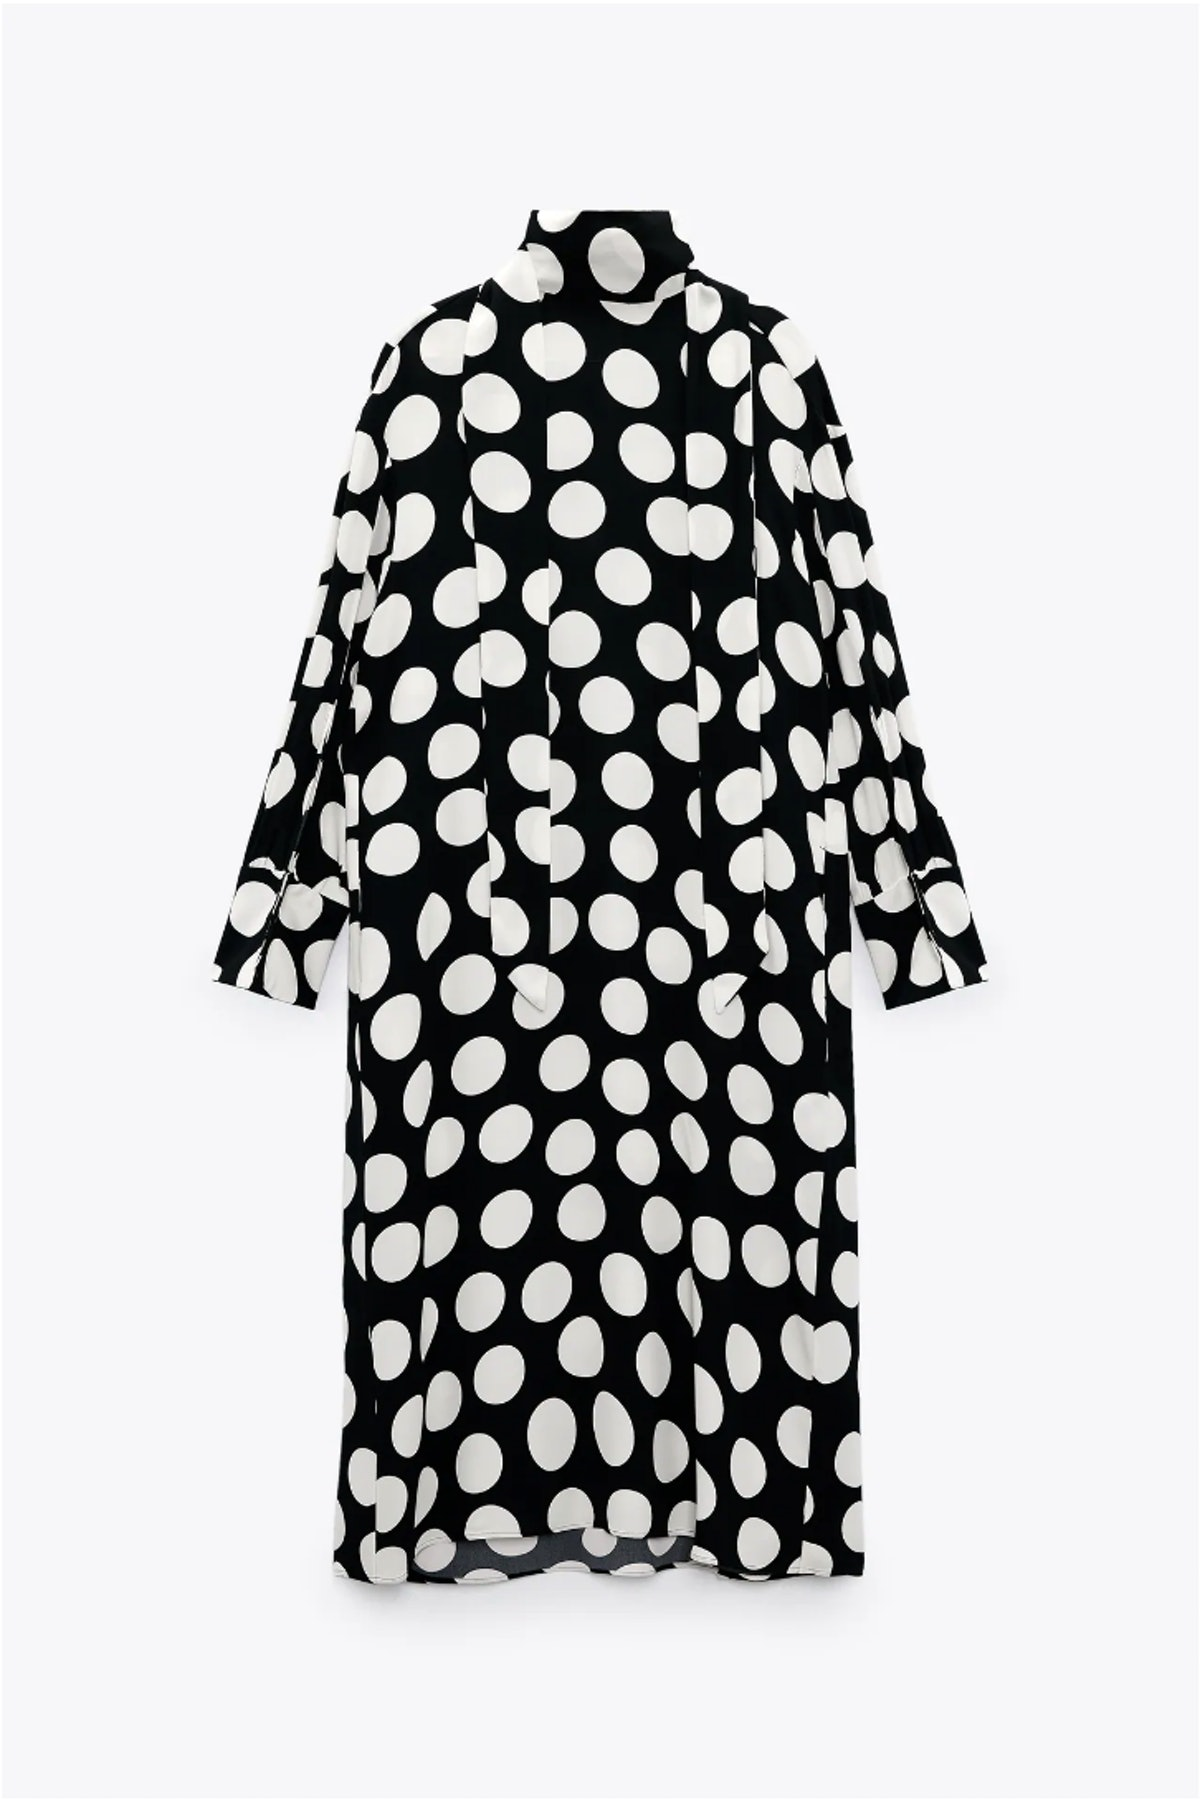 Zara's black and white polka dot tunic dress.